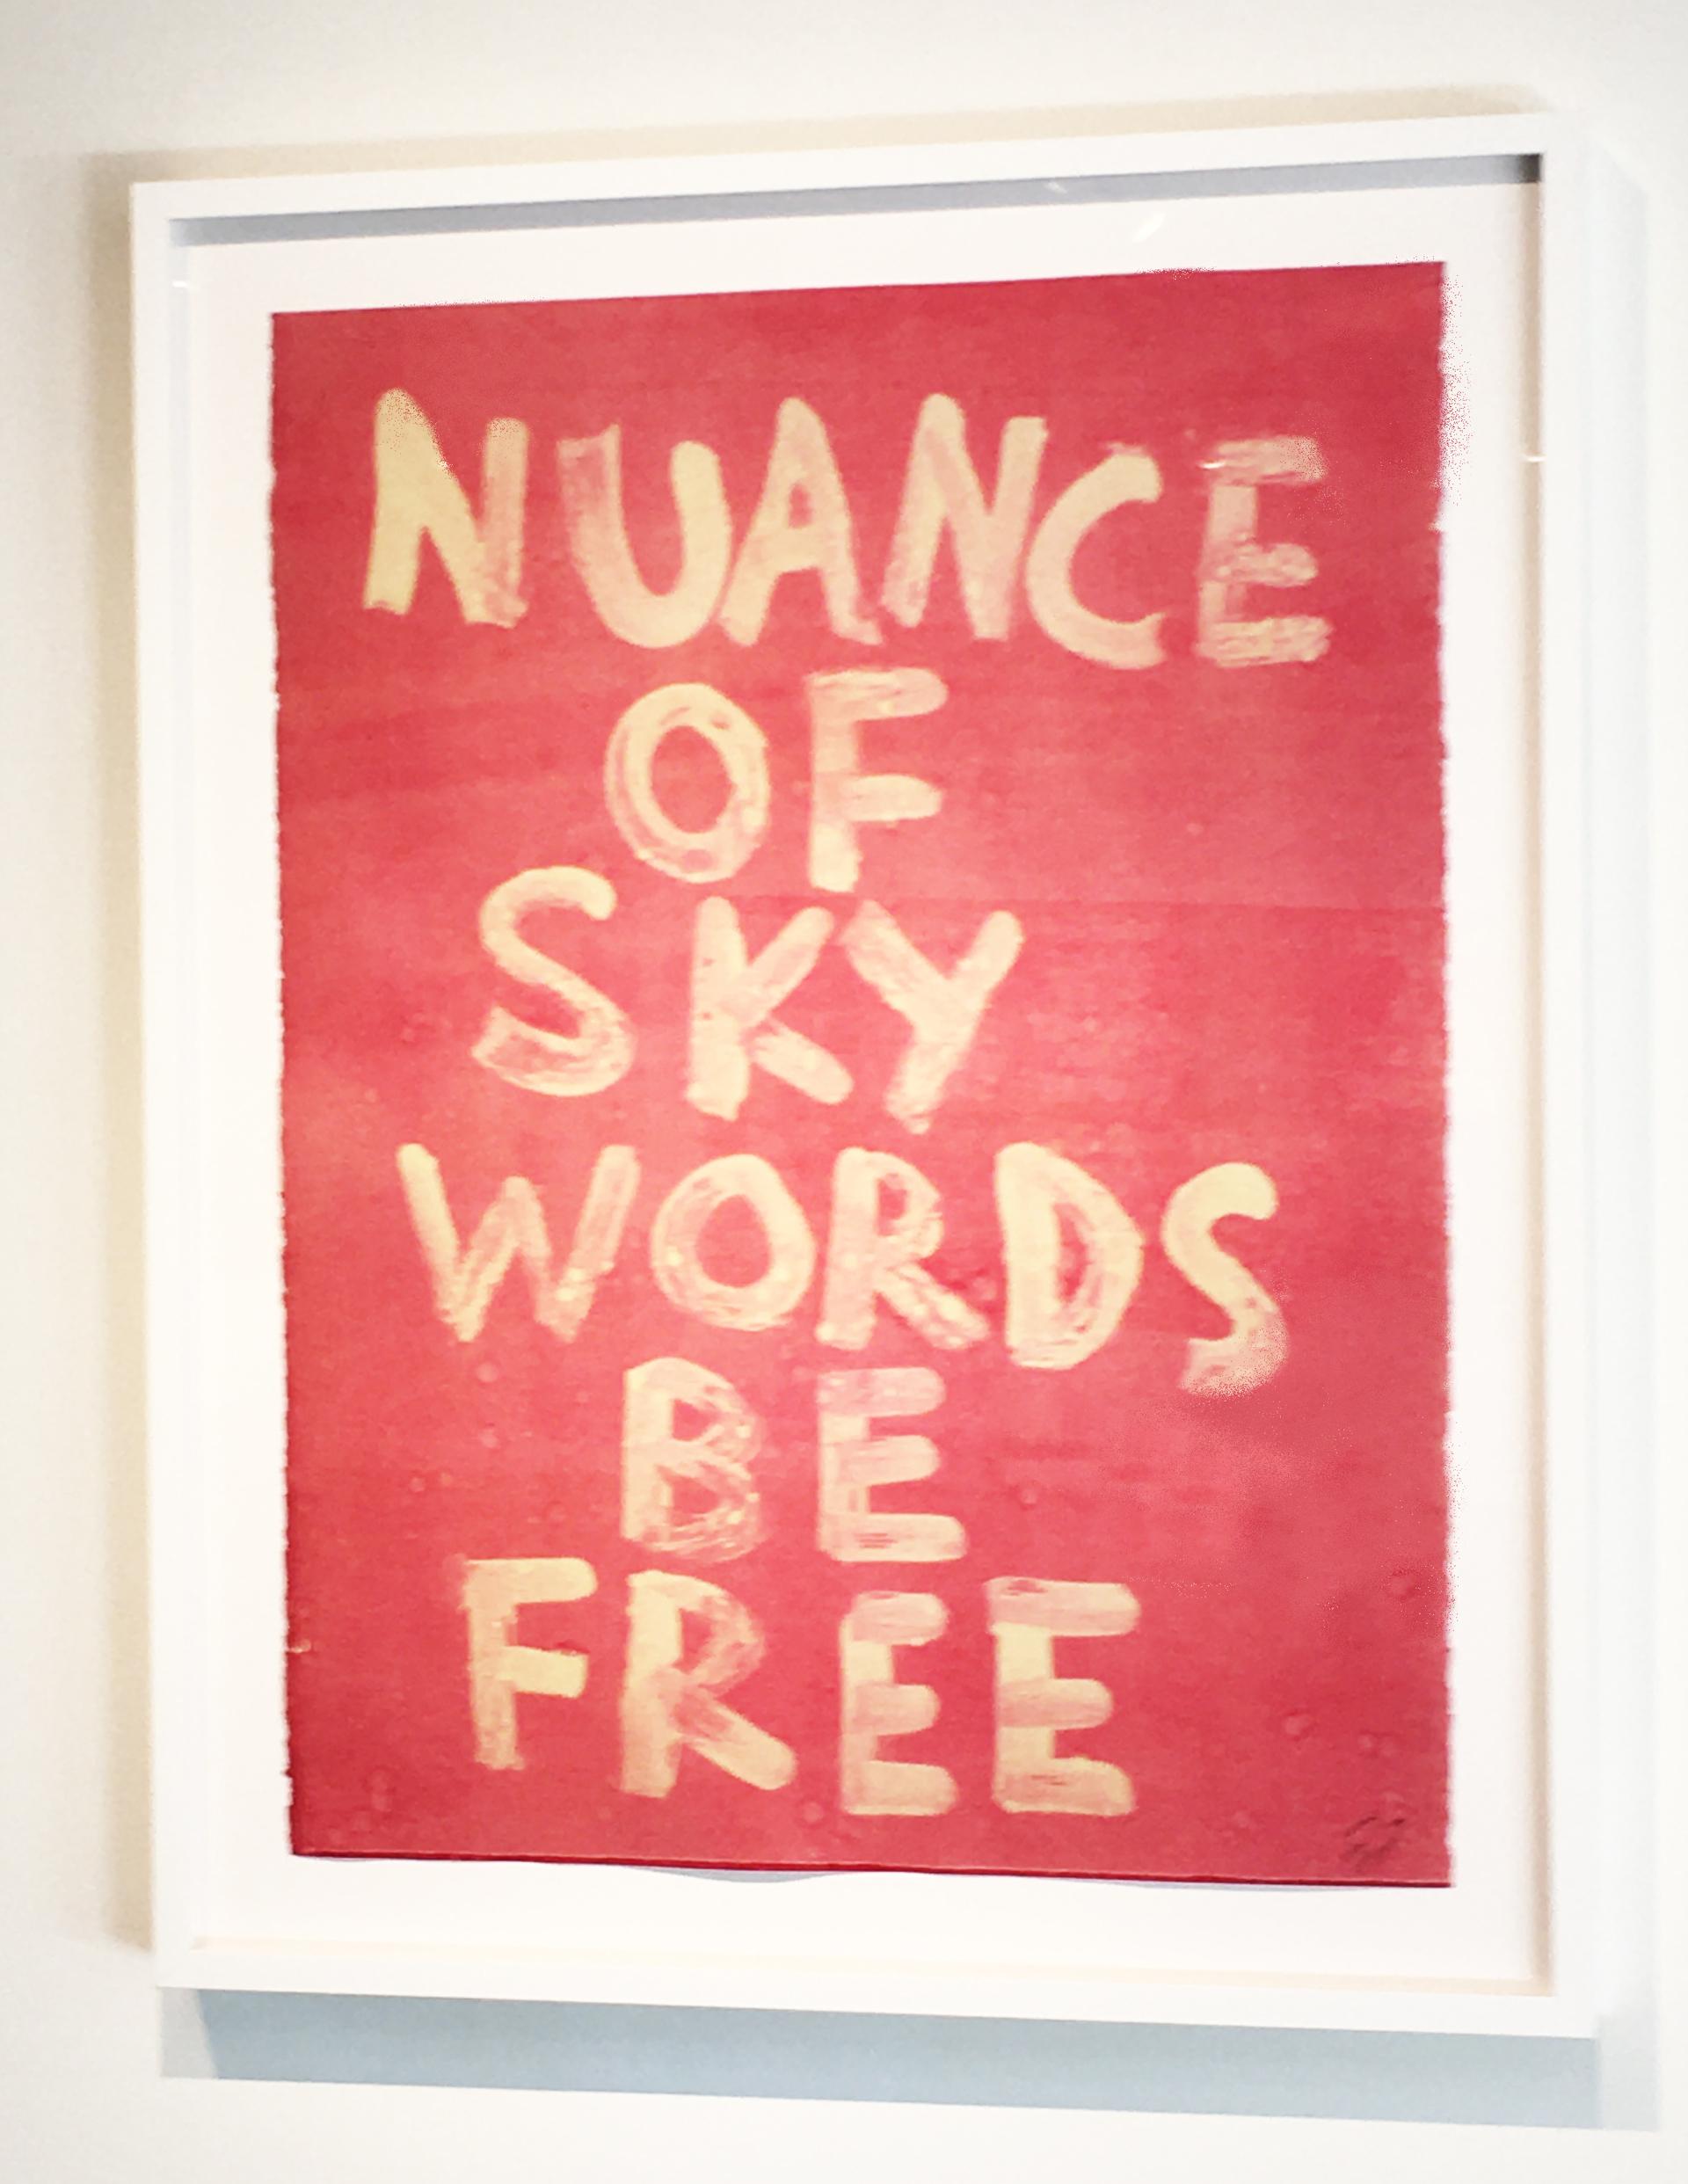 NUANCE OF SKY WORDS BE FREE by Edgar Heap of Birds